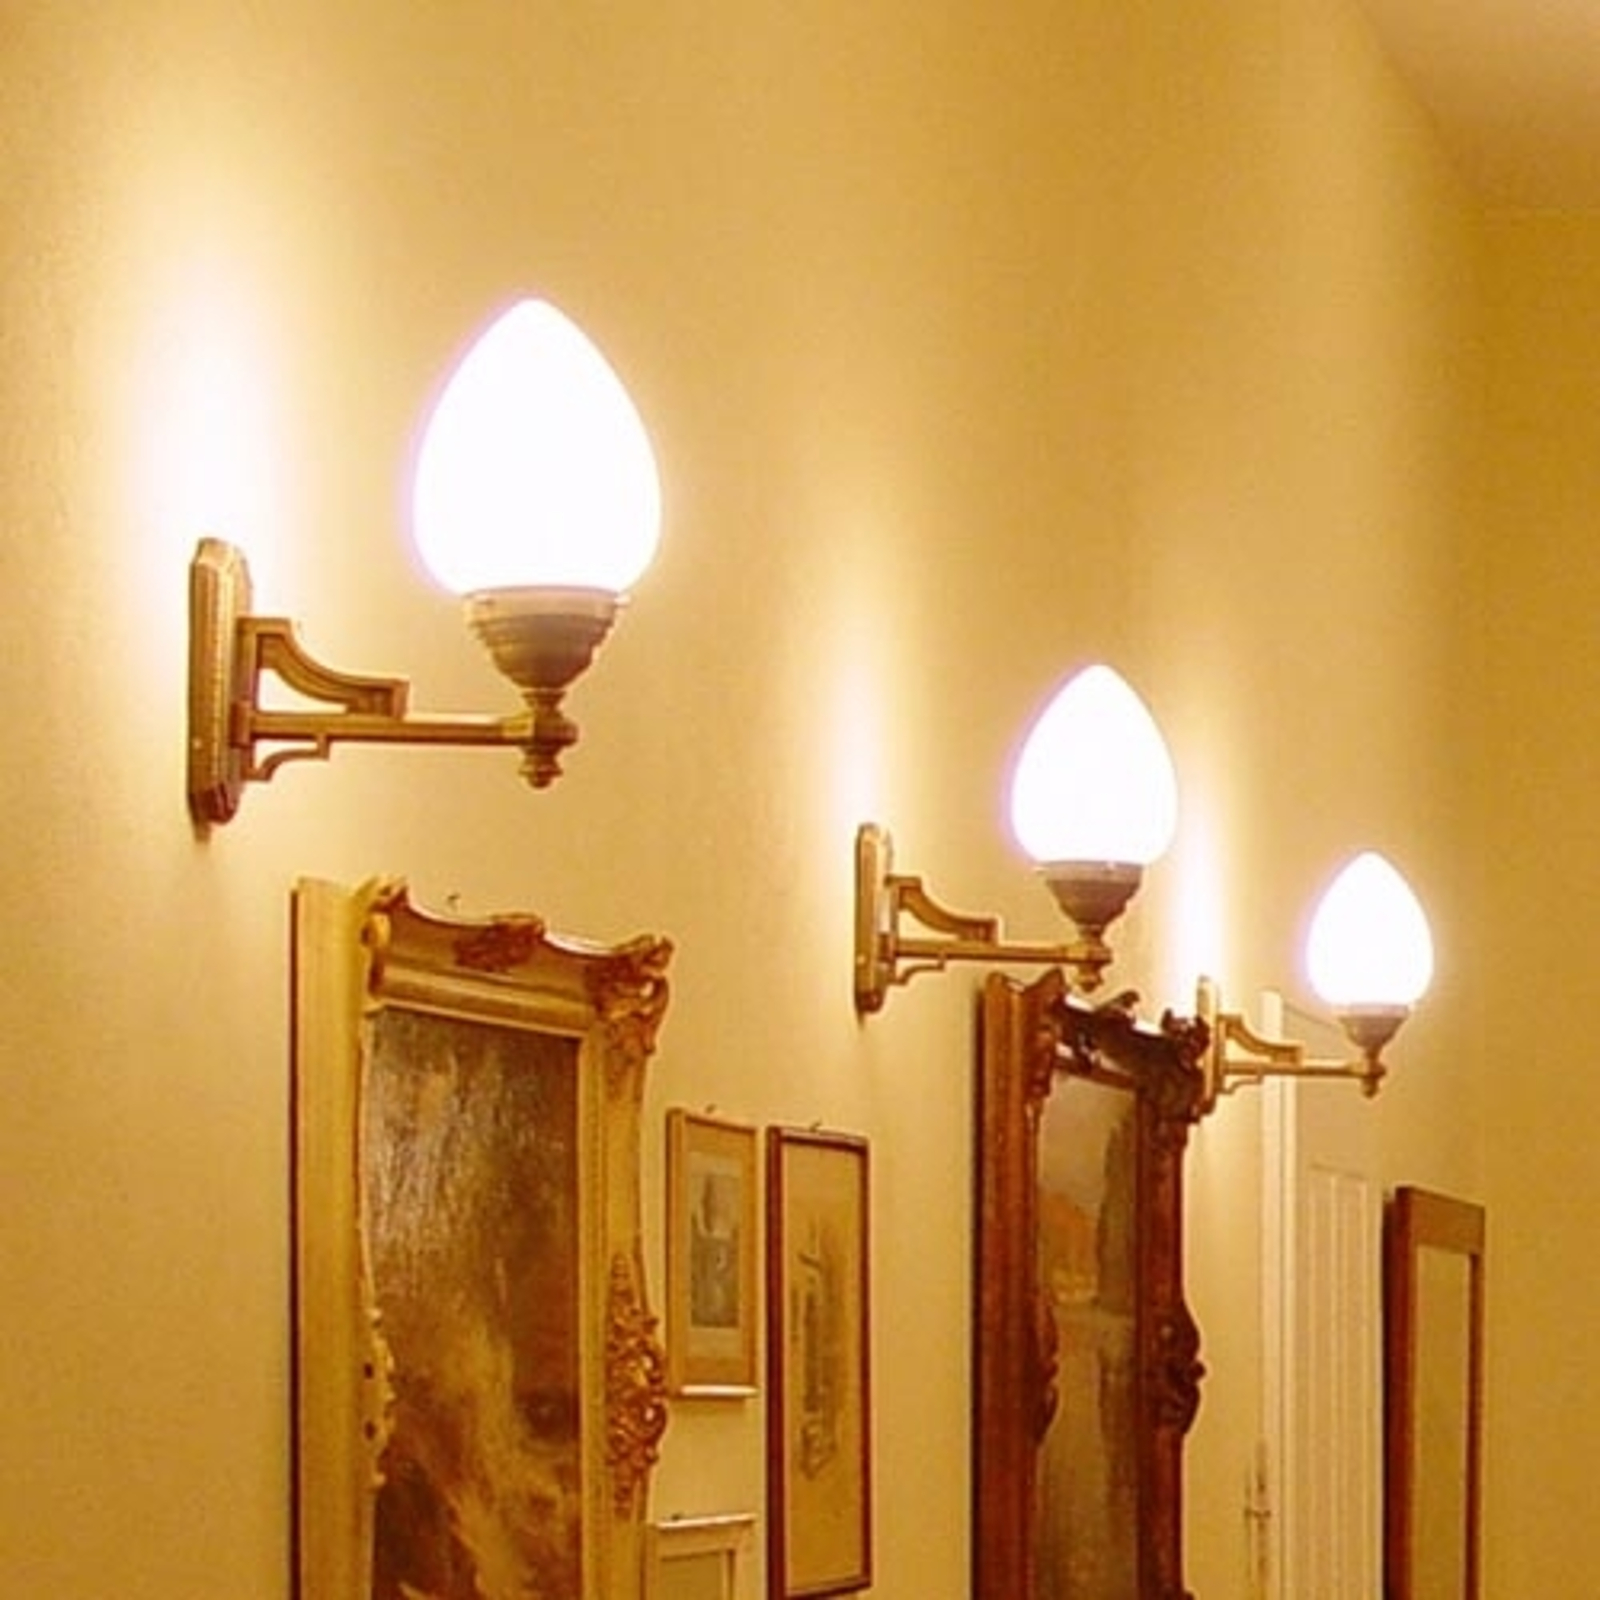 Lampada da parete Venezia in ottone